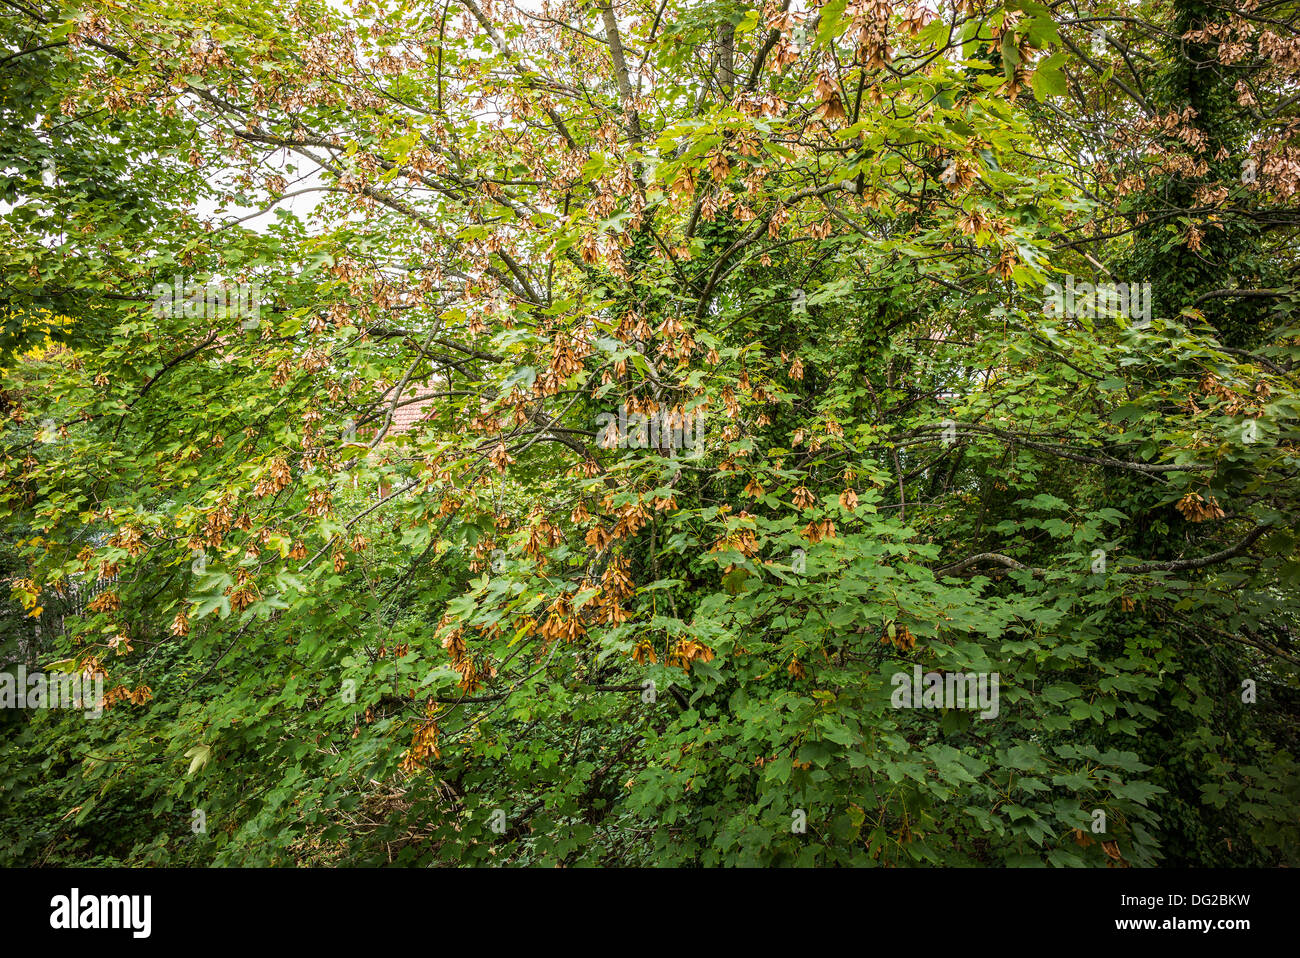 Maple keys on Acer tree Stock Photo